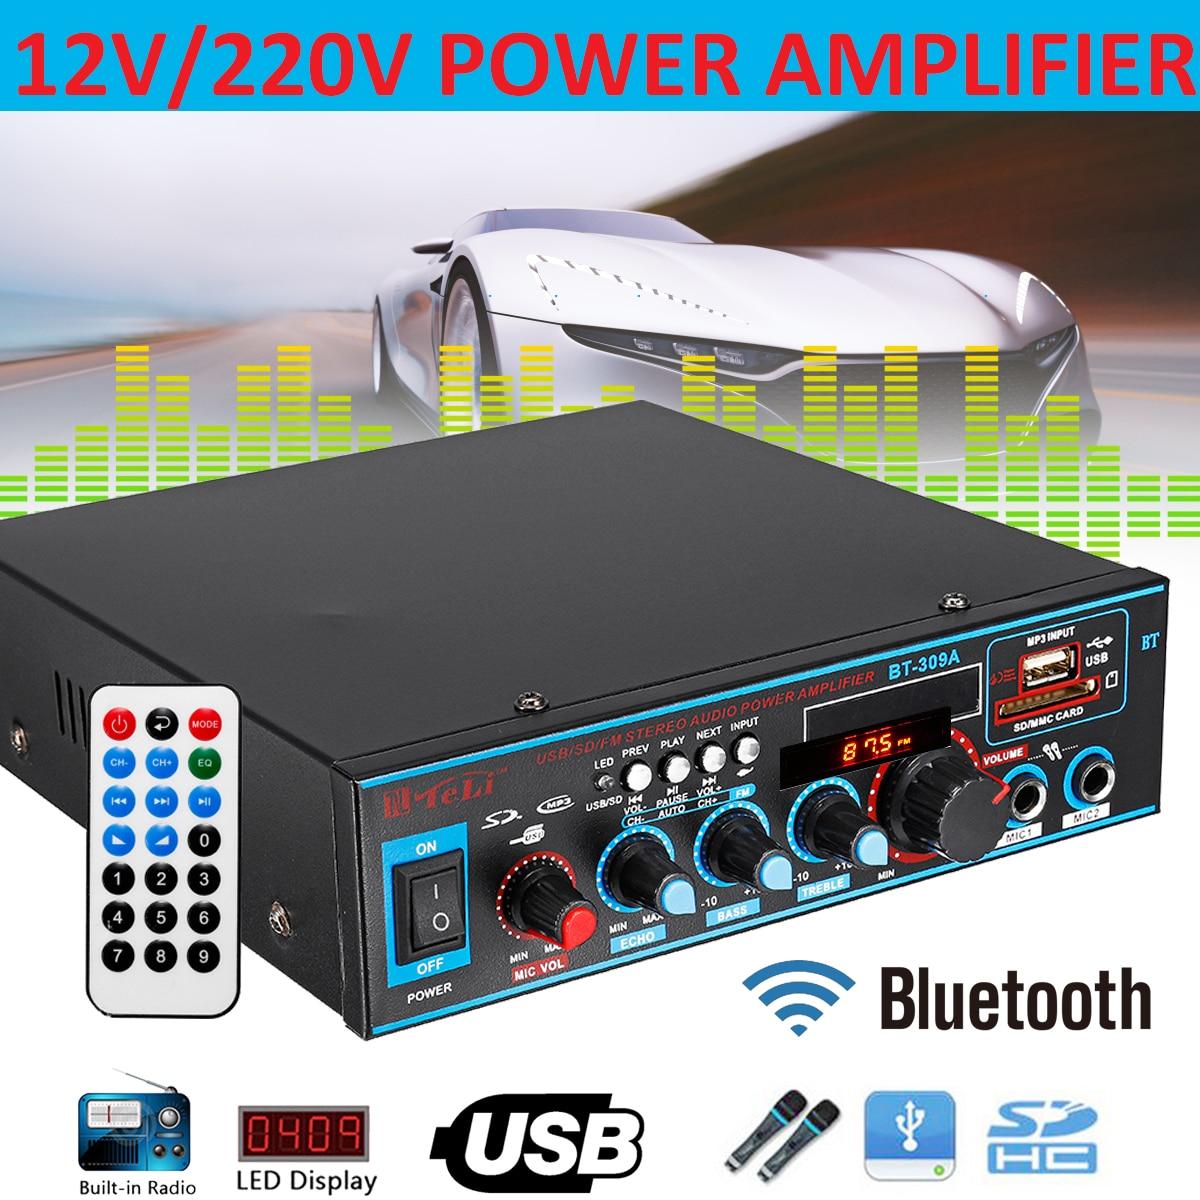 220V 12V 800W Car Audio Stereo Power Amplifier Bluetooth USB FM Radio Home Theater Karaoke Amplifiers Audio Music Loudspeaker 300w 300w 2 channel hifi audio stereo power amplifier bluetooth fm radio car home theater amplifiers music player